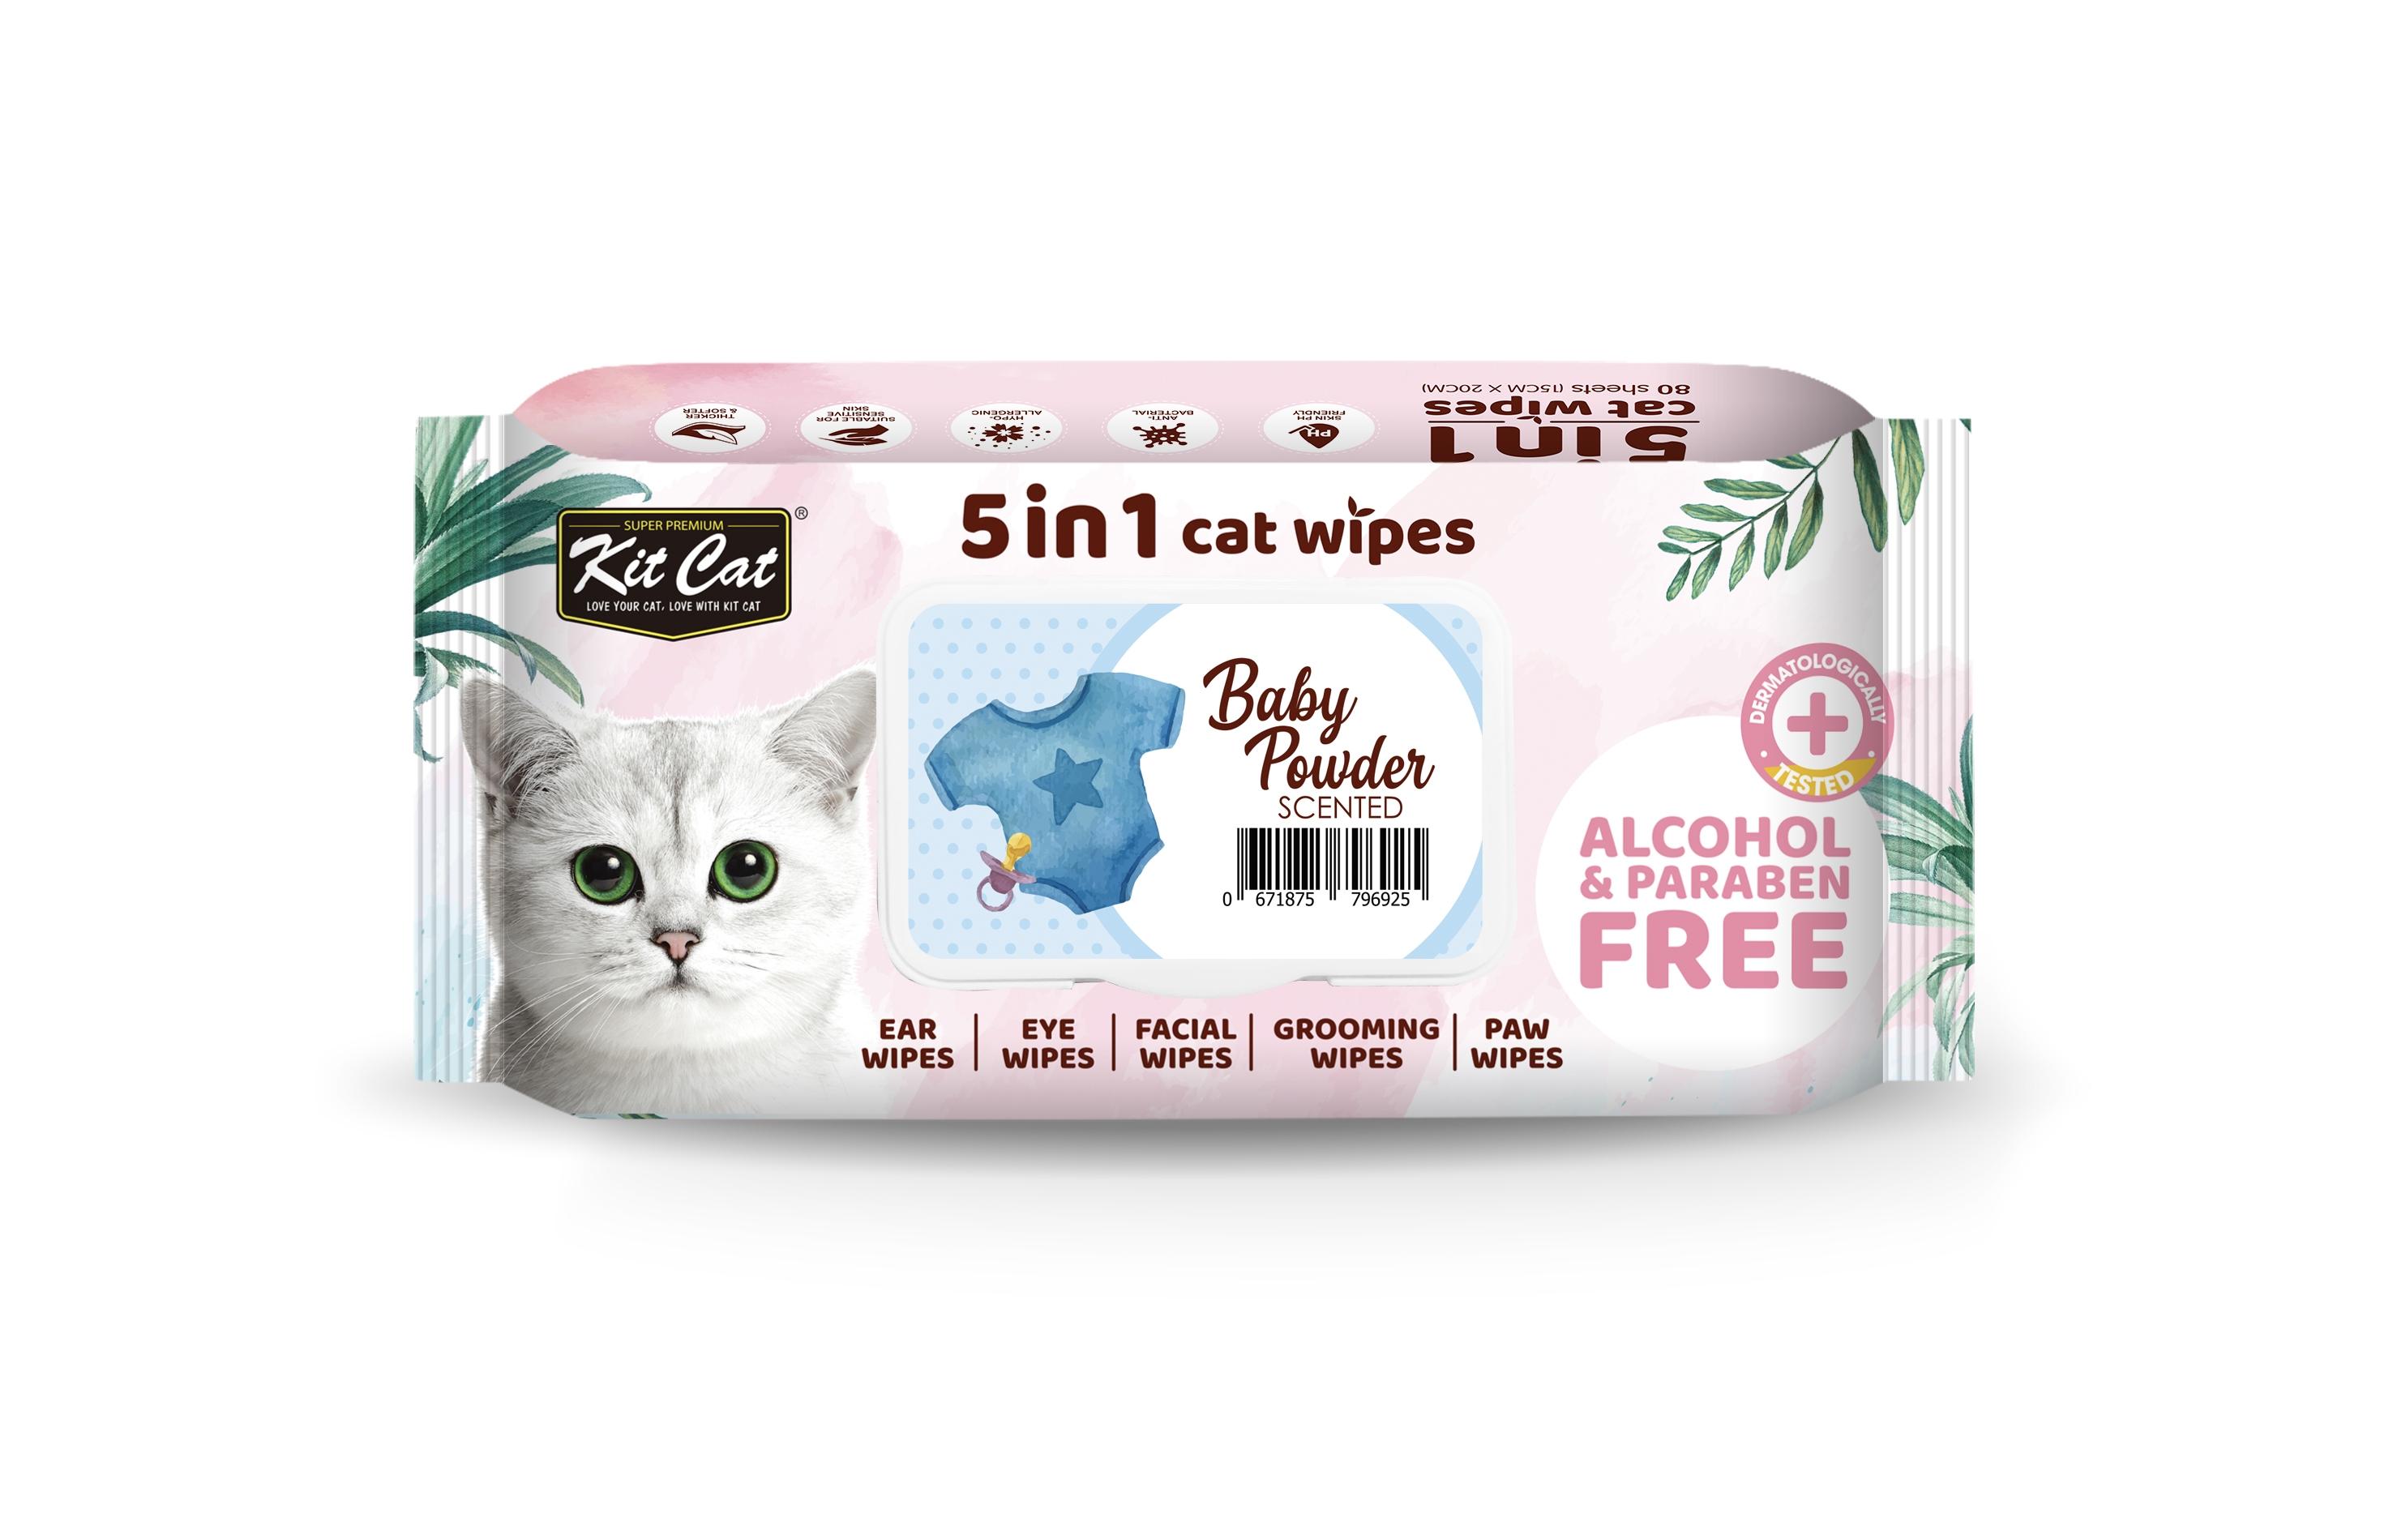 Servetele umede pentru pisici, Kit Cat 5in1 Baby Powder, 80 buc imagine